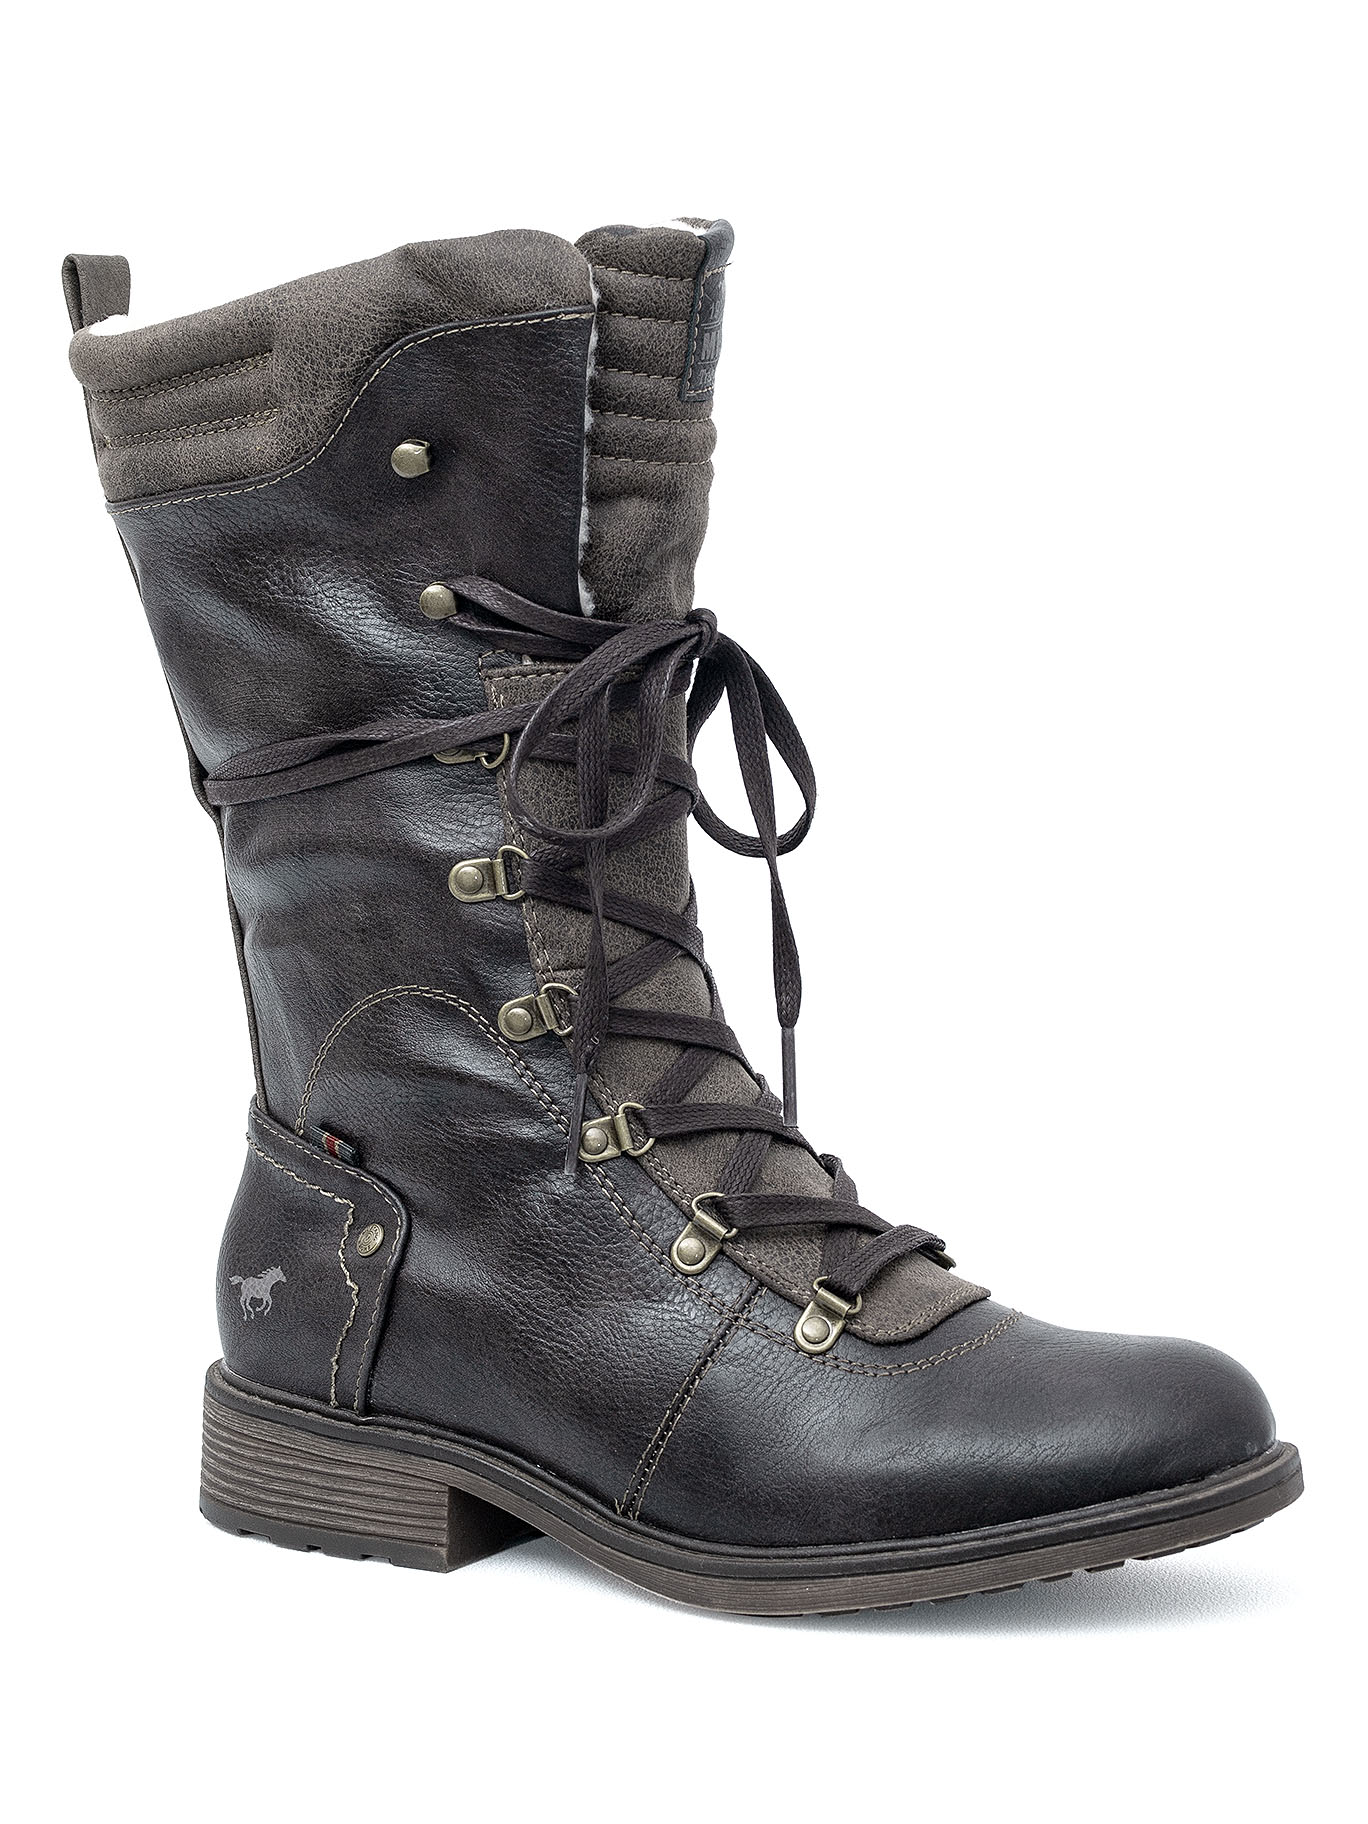 c2d6ae250c832 Kozaki damskie Mustang 43C-009 (1264-612-303) mustang shoes